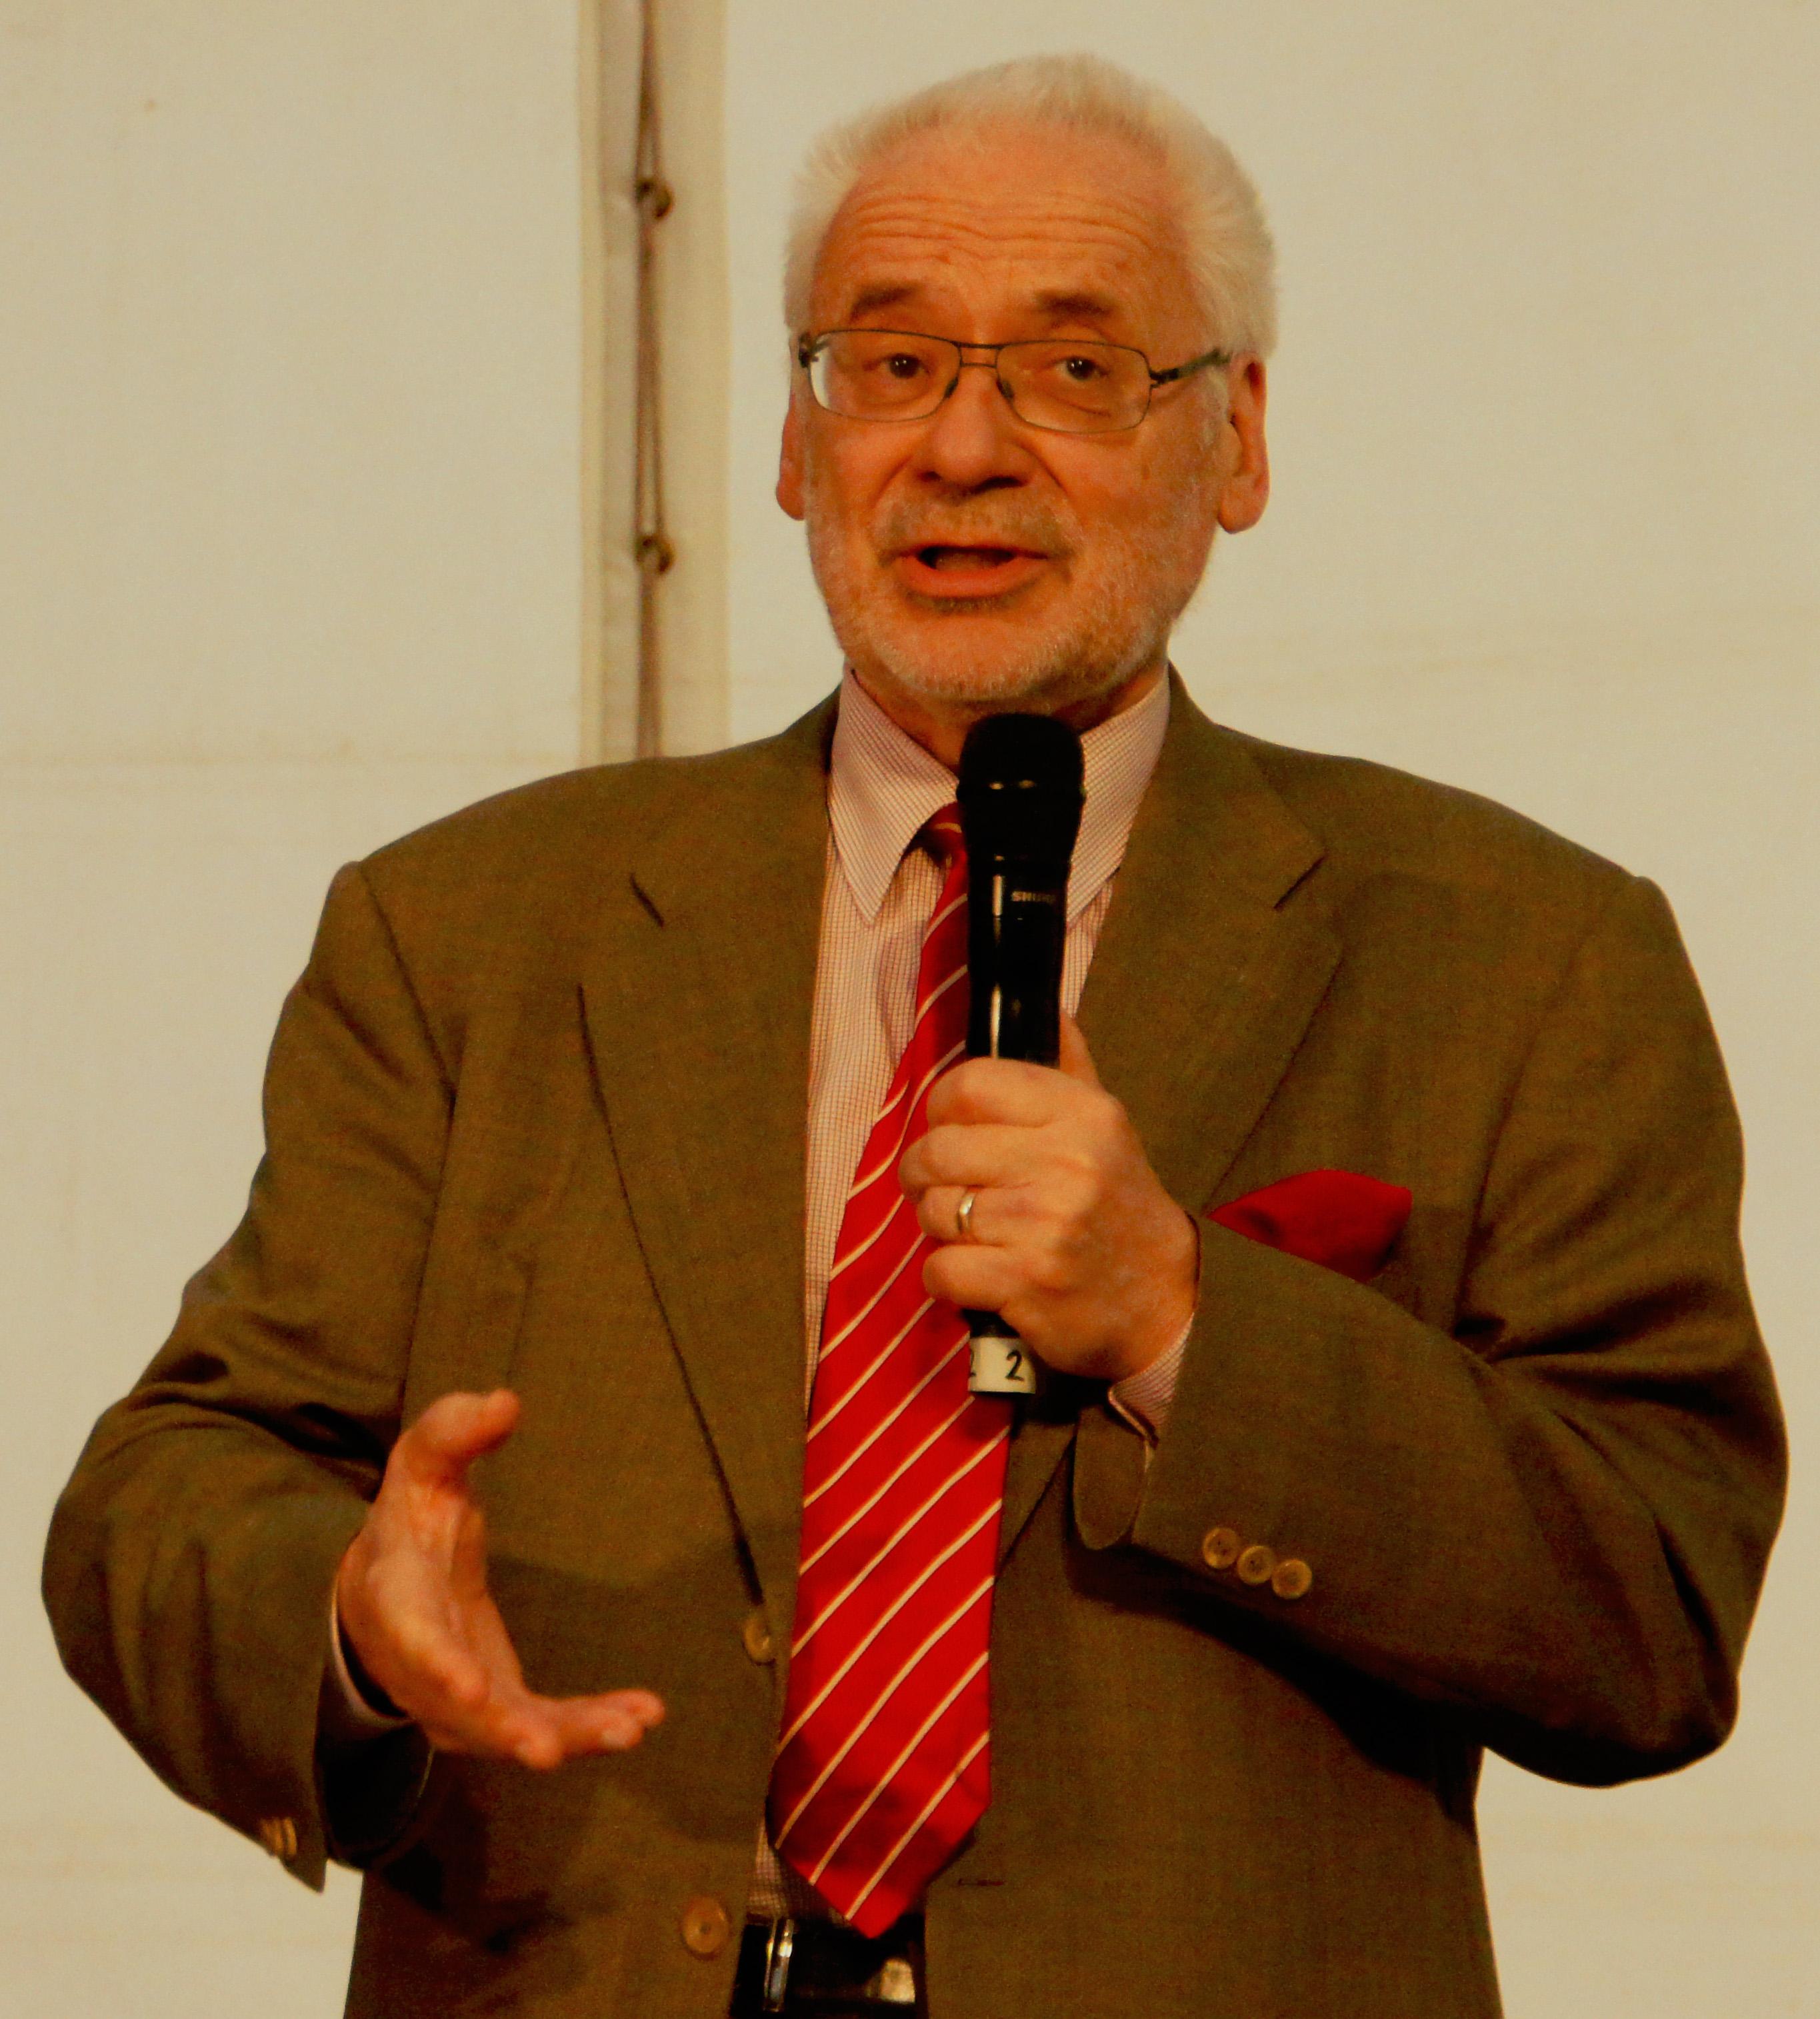 Erhard Busek - Wikipedia